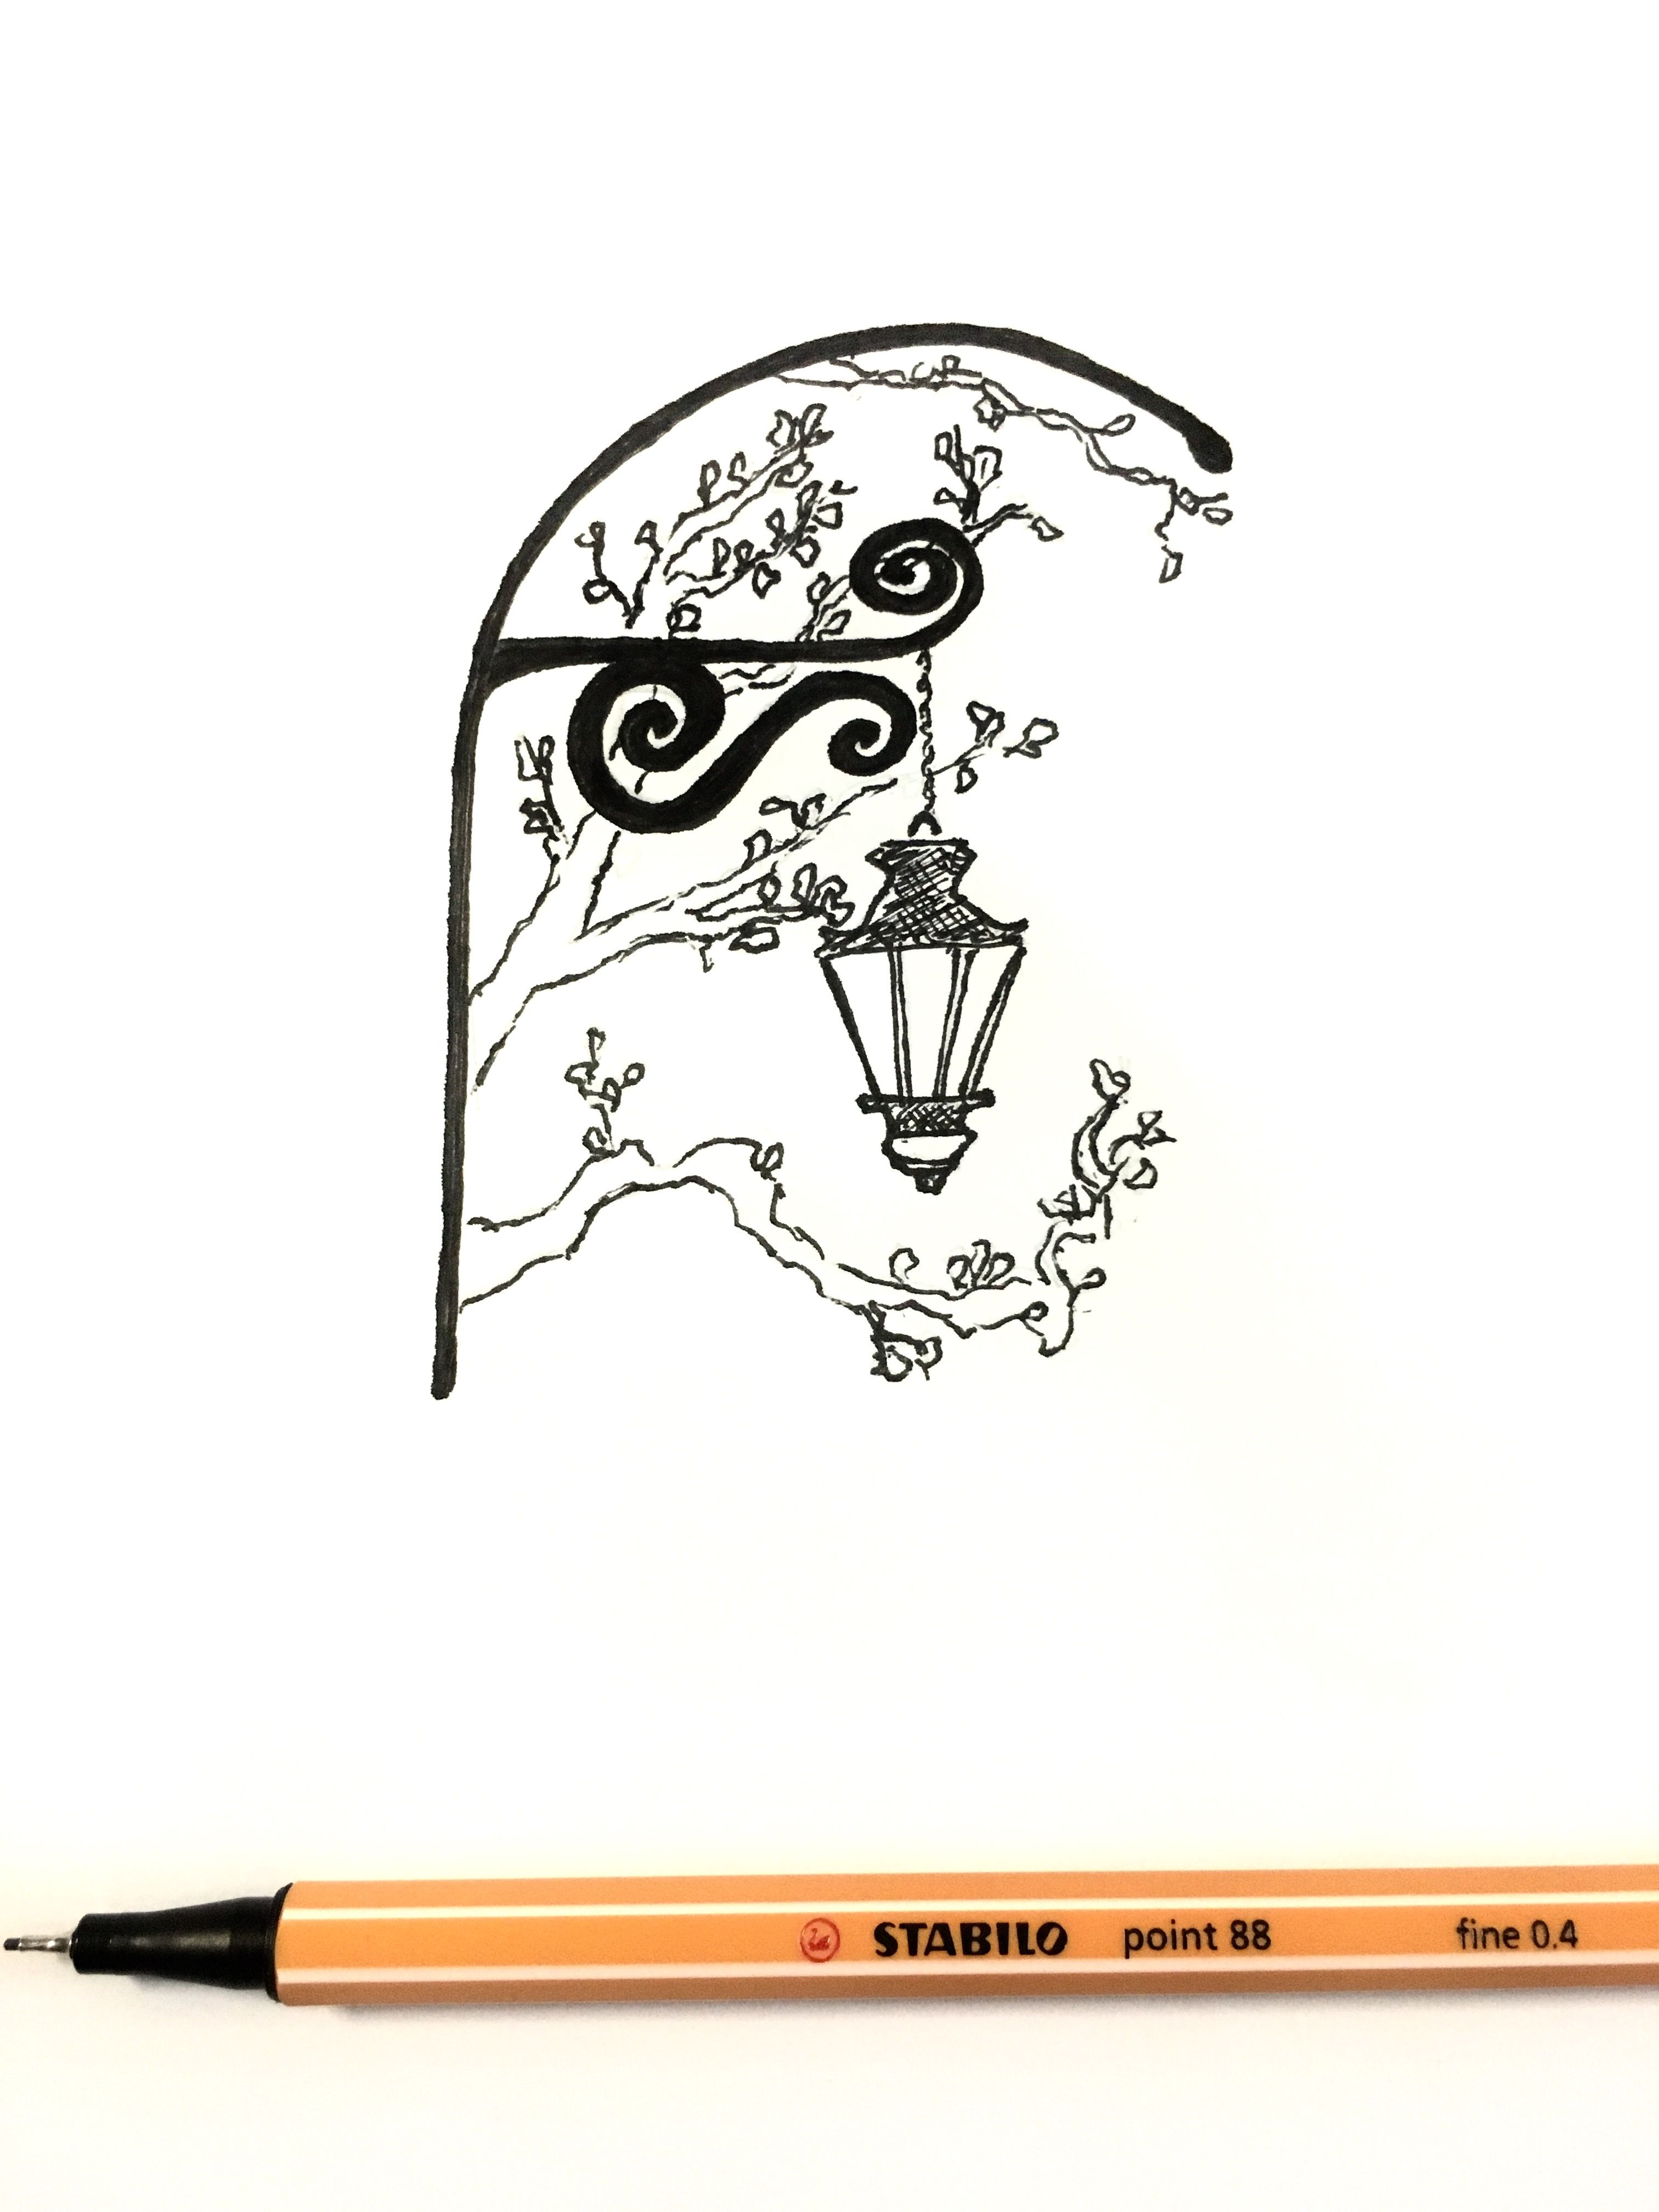 #light #flowers #old #blackandwhite #draw #handdraw #ViannaV